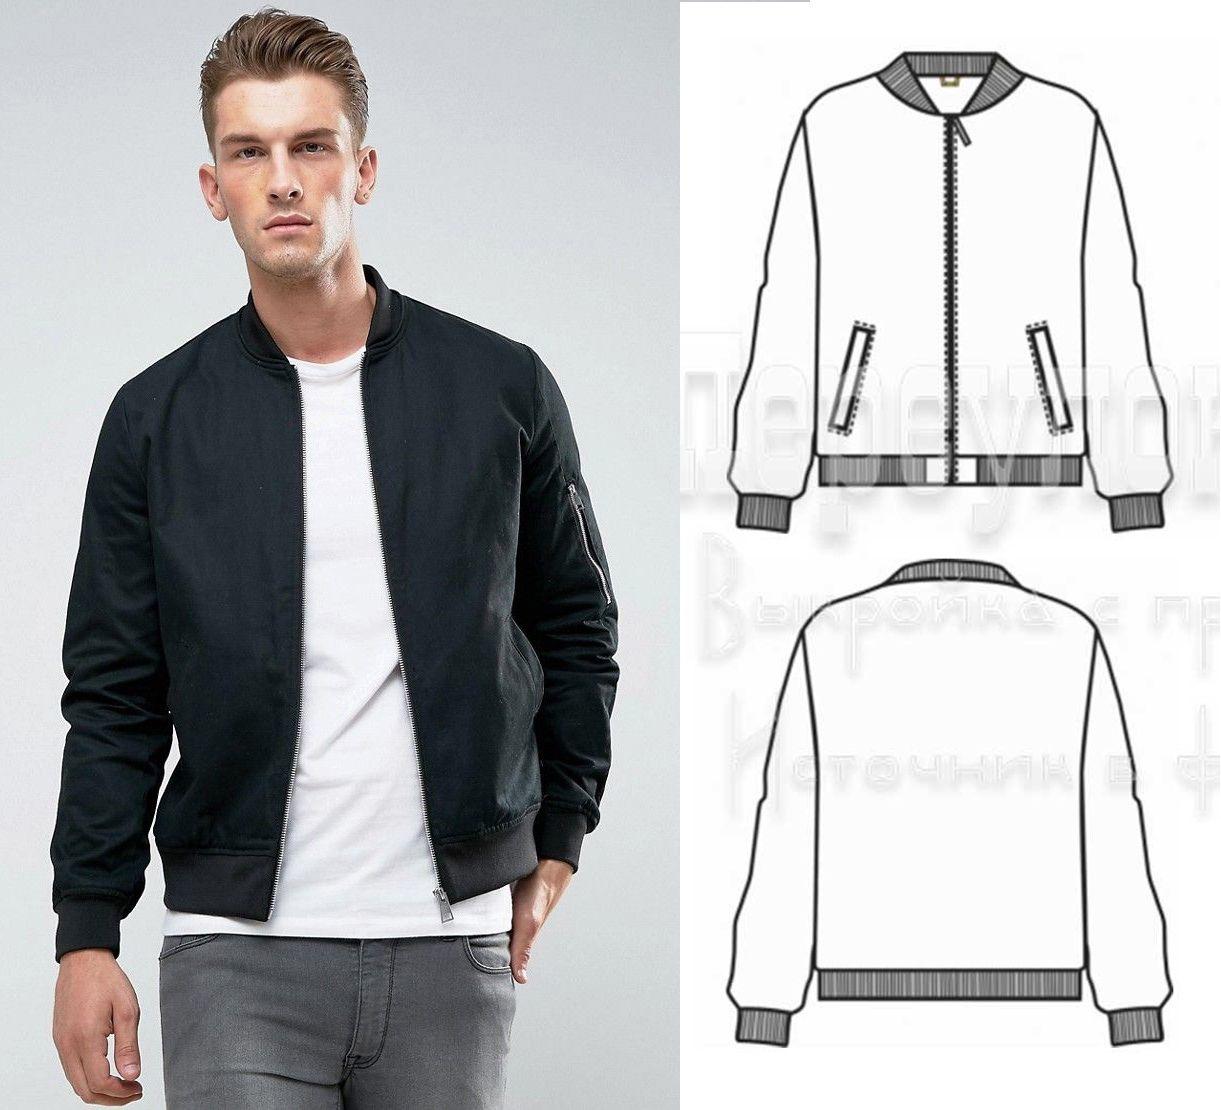 Bomber Jacket Sewing Pattern For Men (Sizes 44-52 Eur)